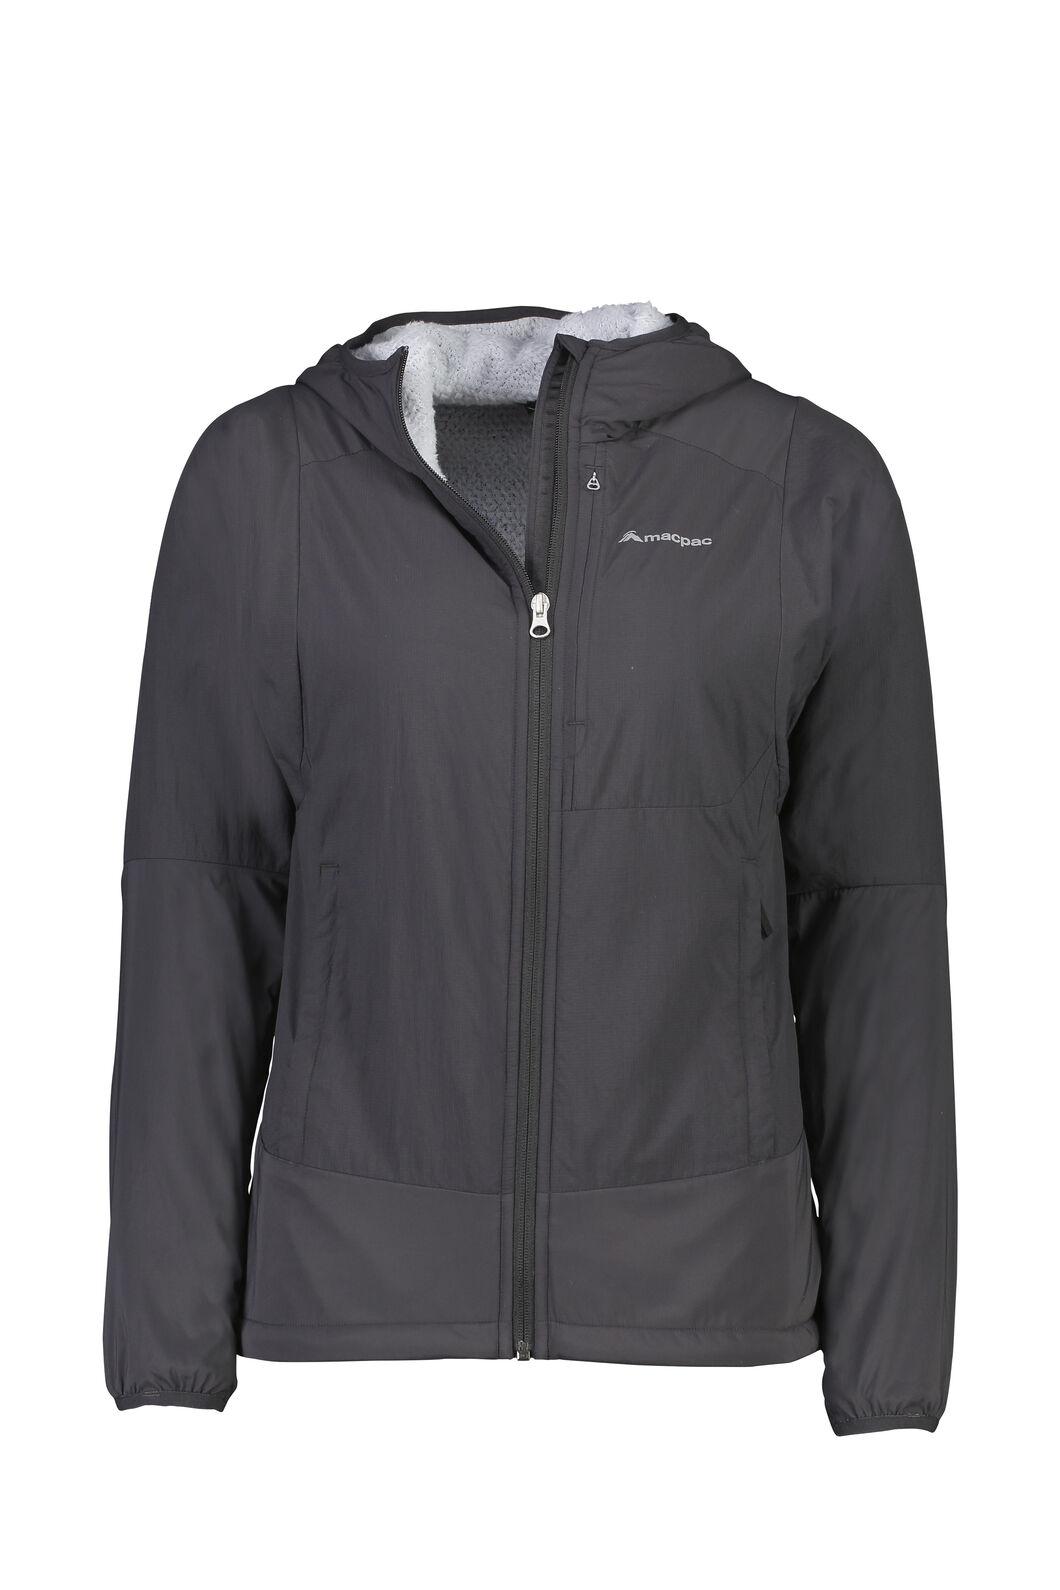 Macpac Pisa Polartec® Hooded Jacket — Women's, Phantom, hi-res